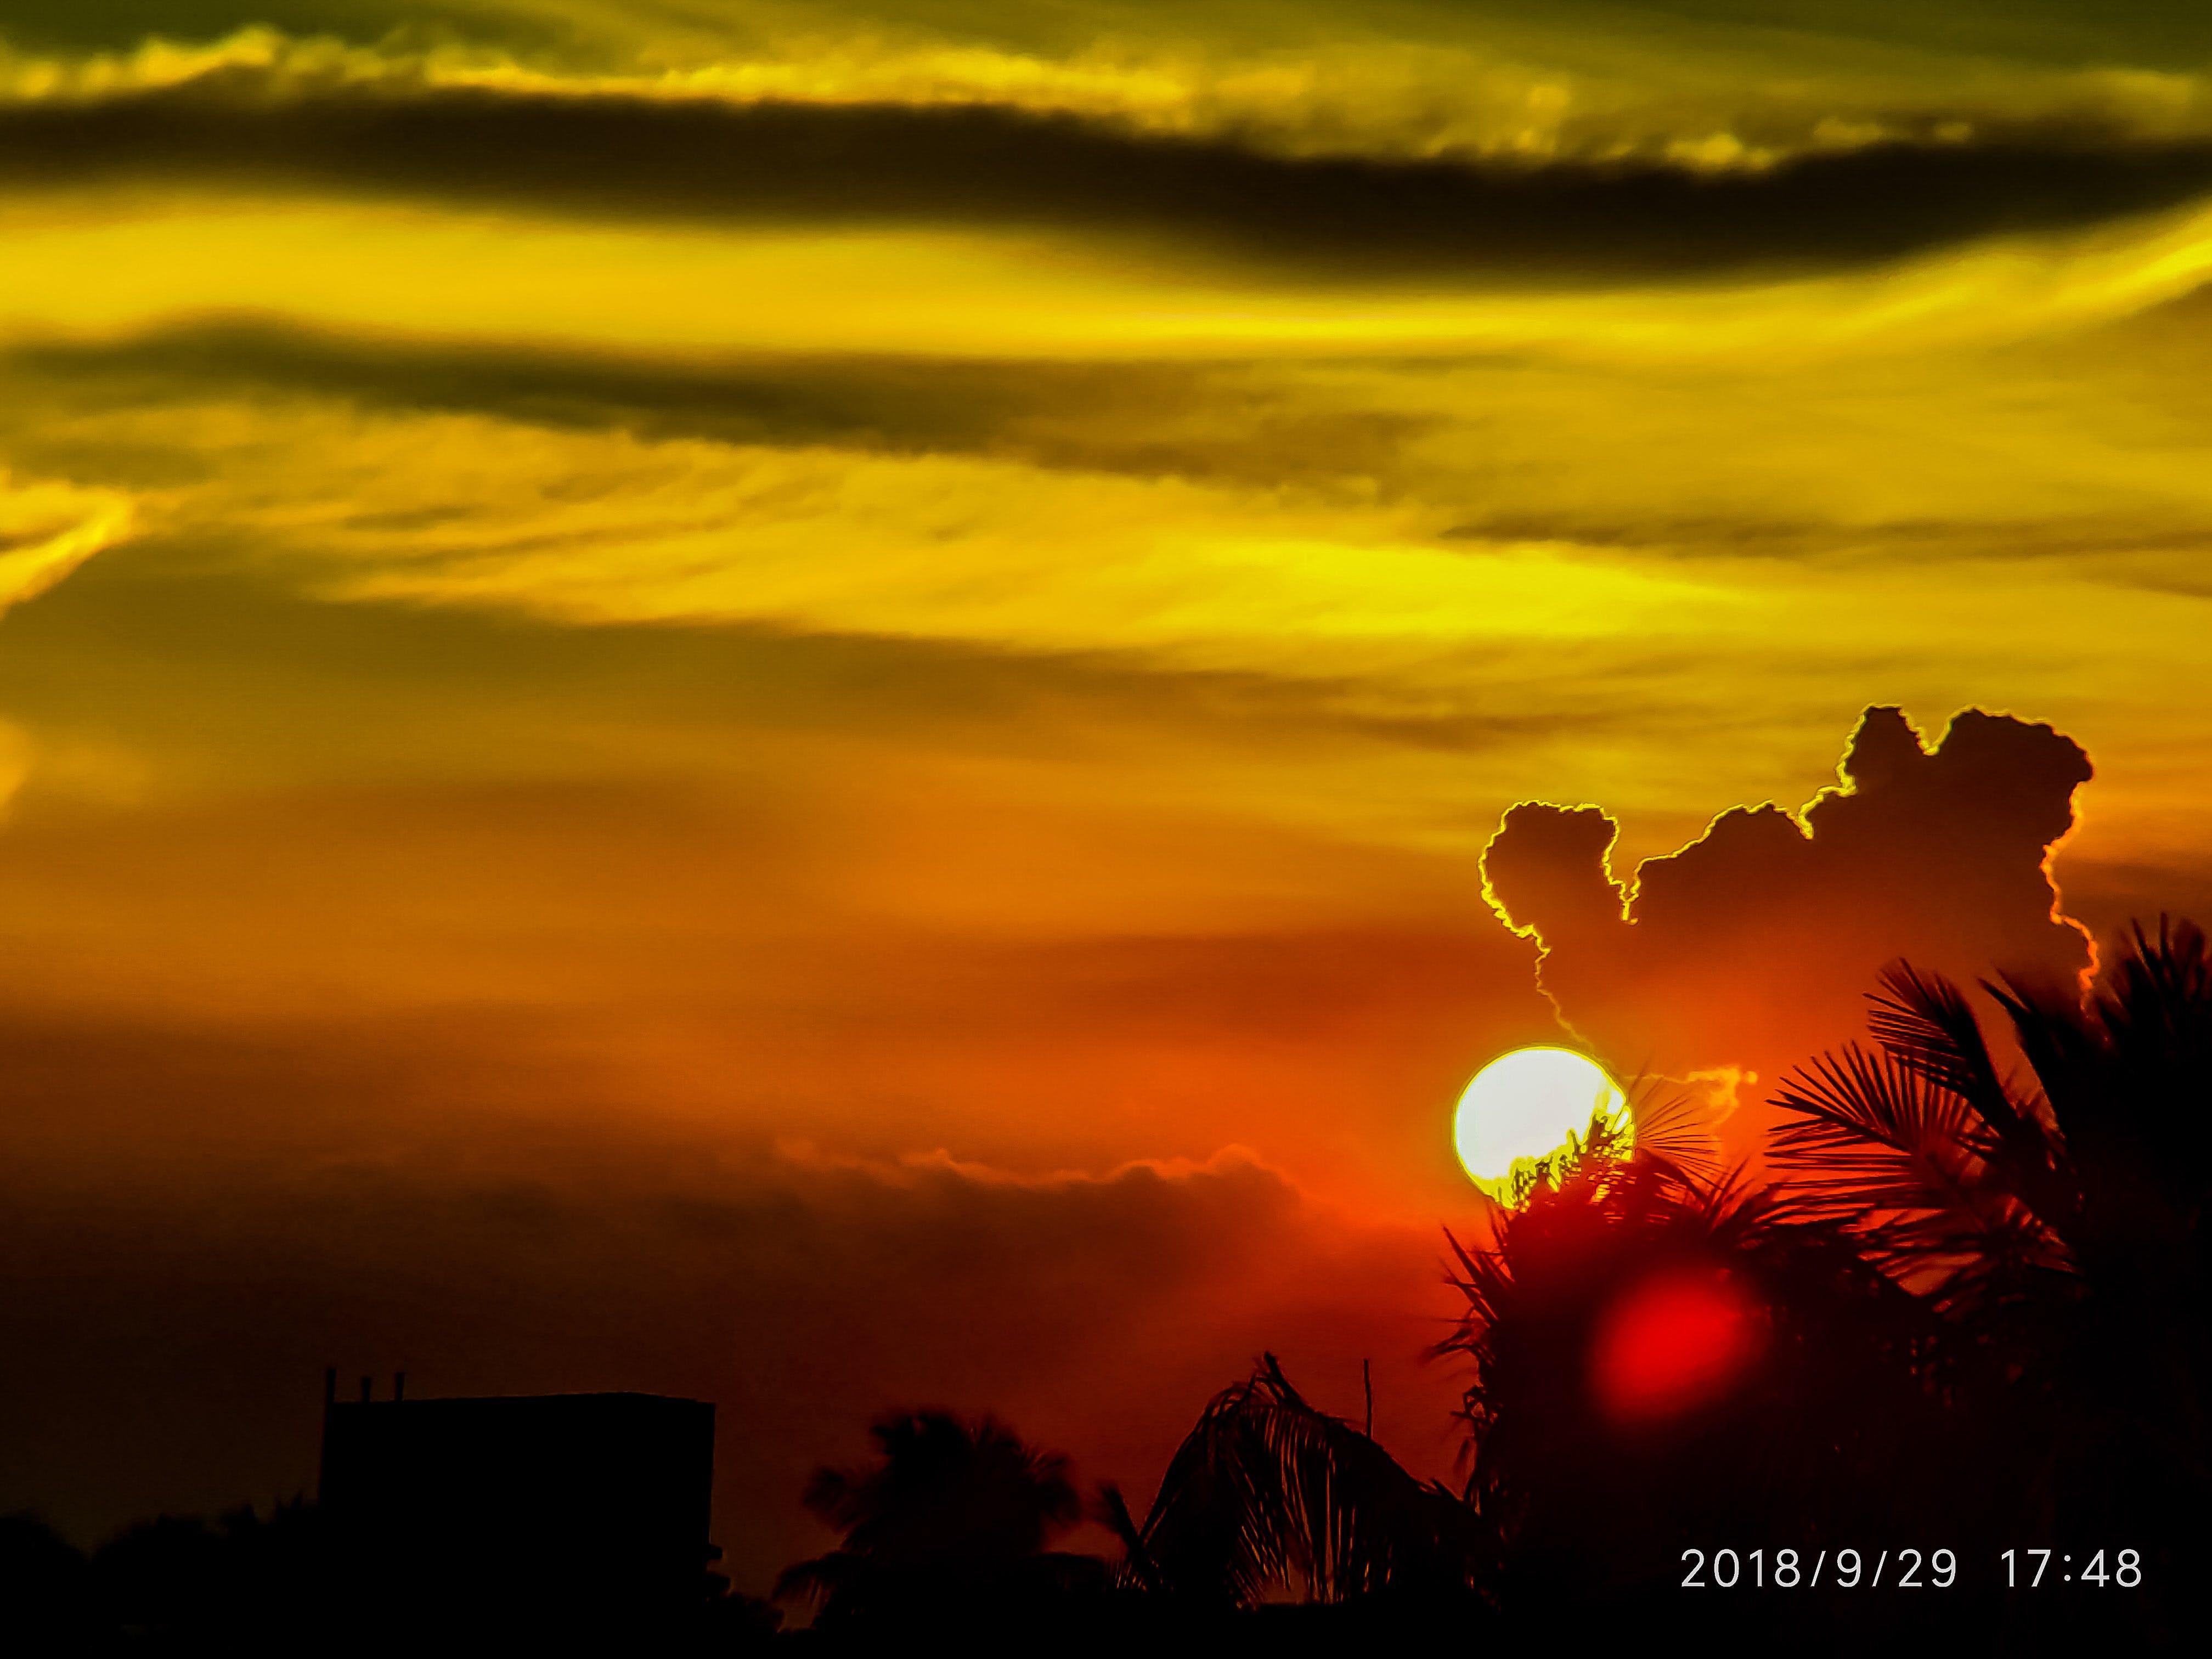 Free stock photo of sunset, Sunset through trees